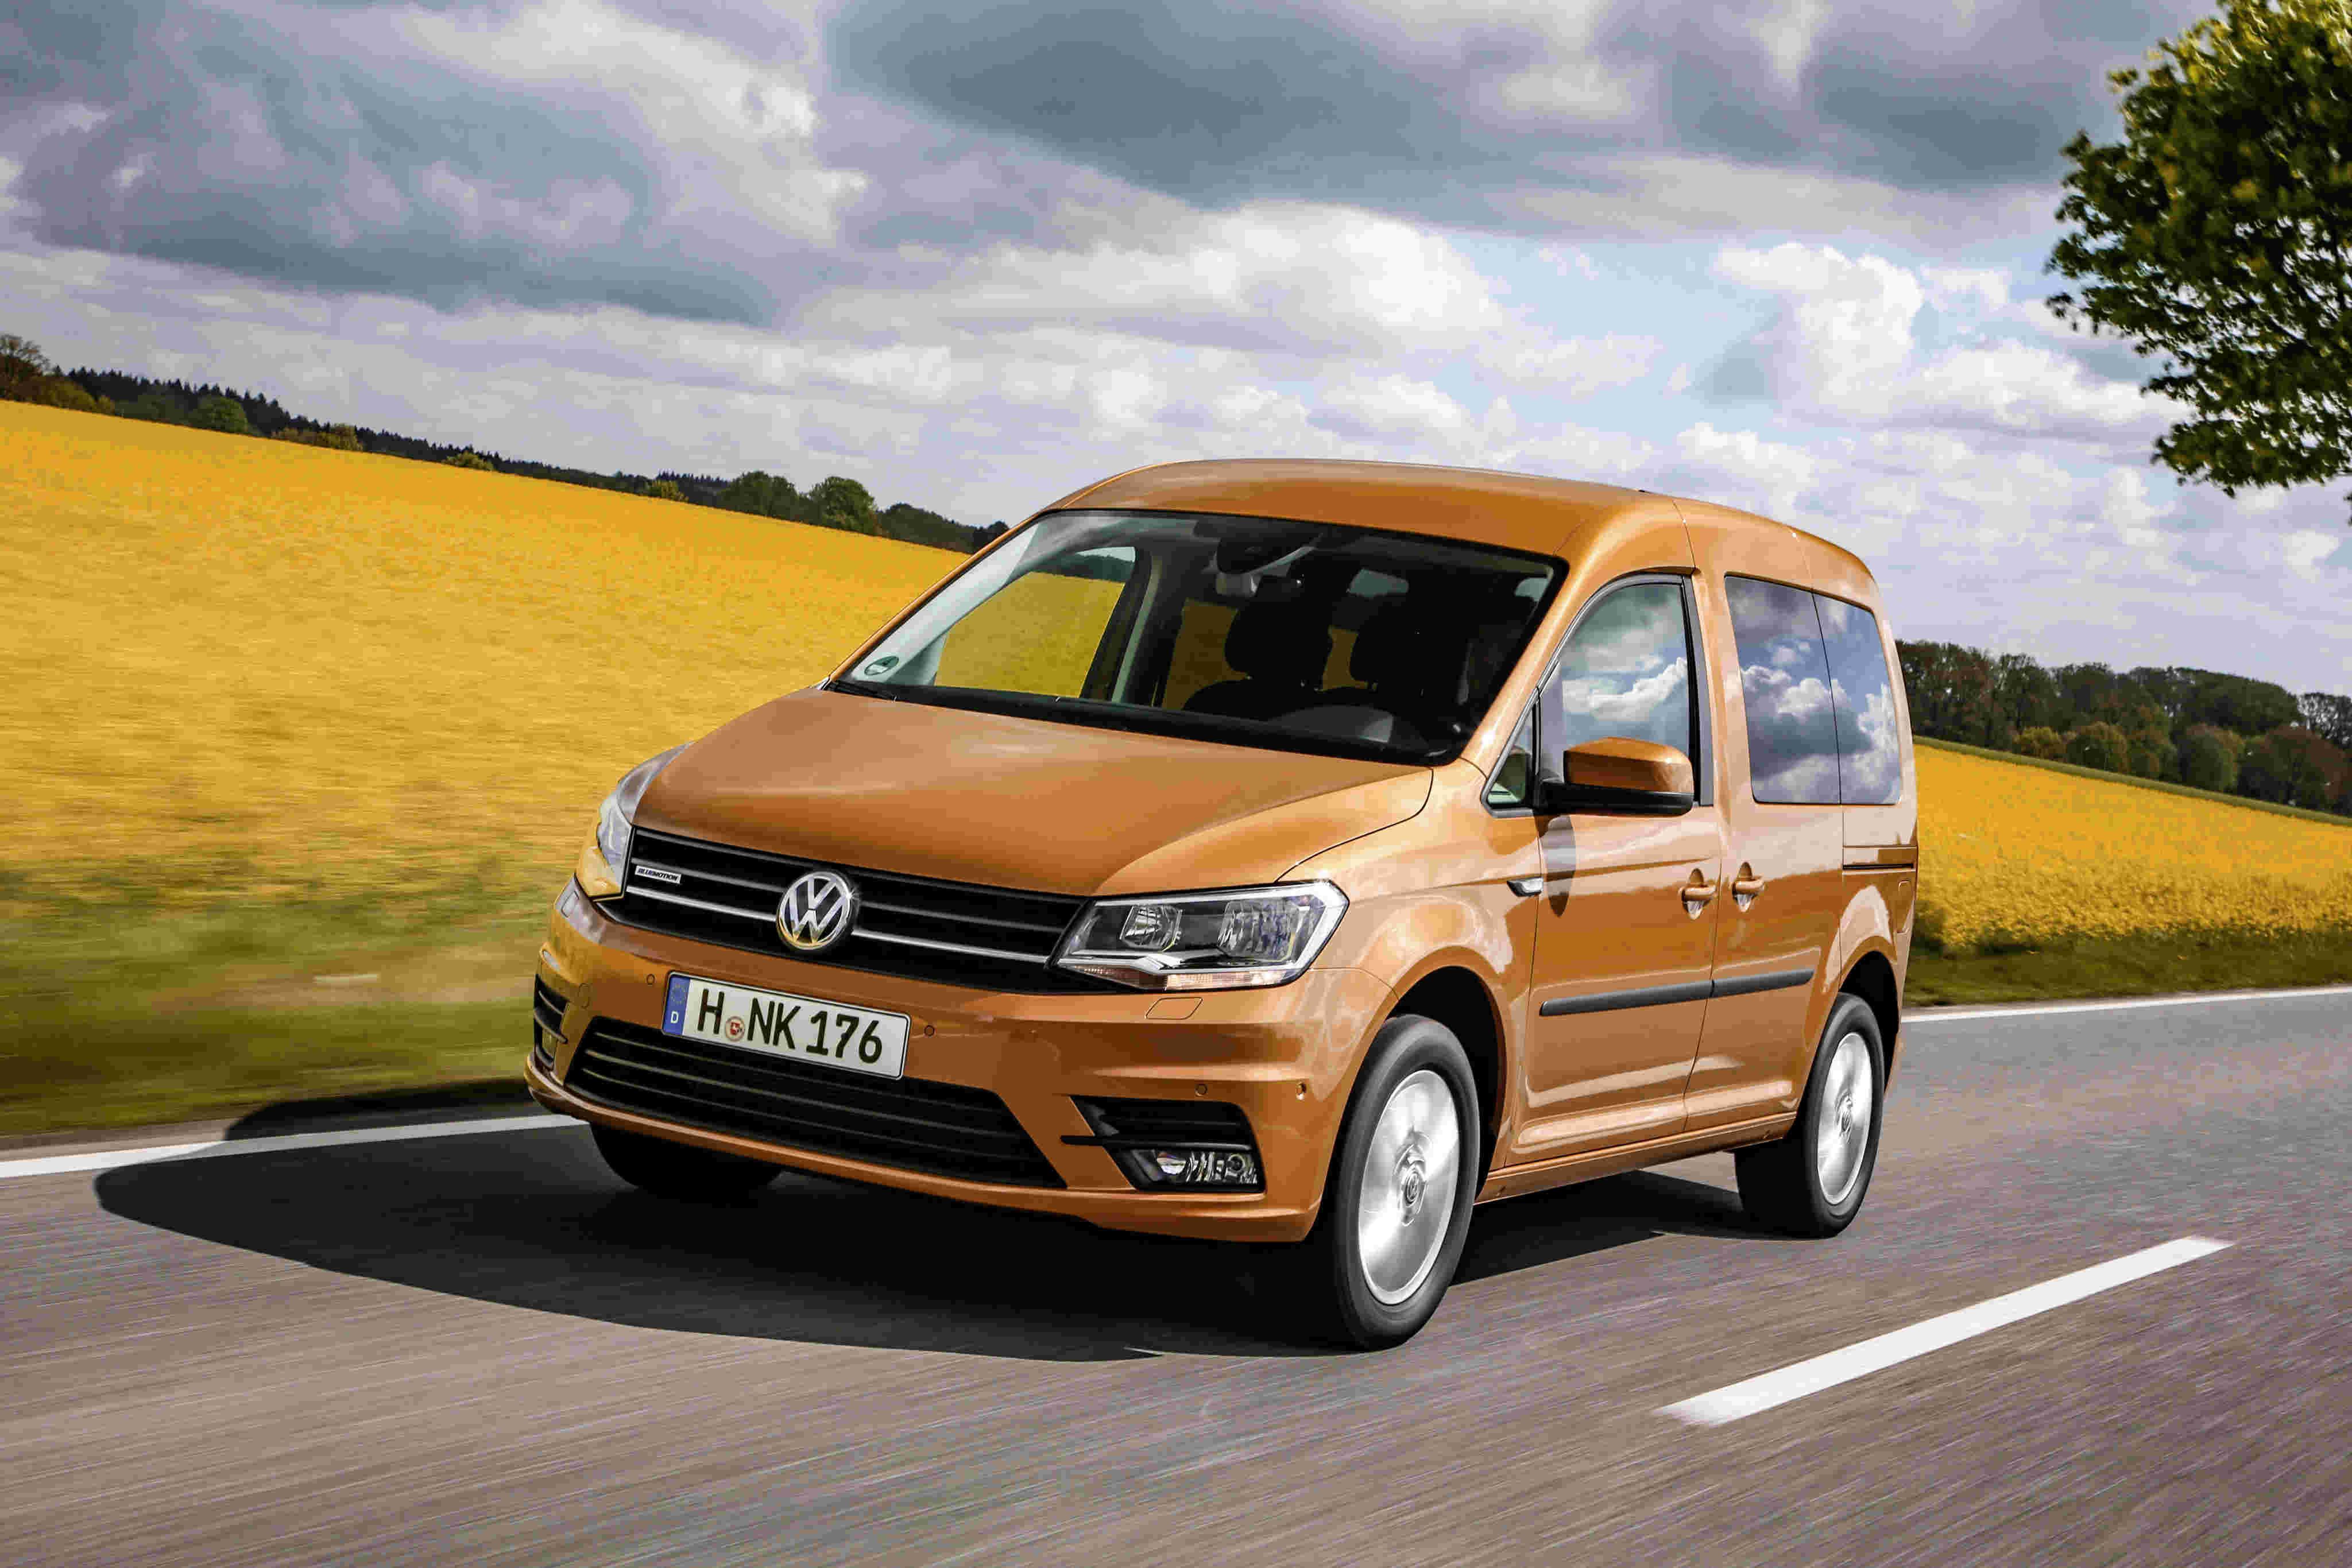 Zahnriemenwechsel beim VW Caddy II